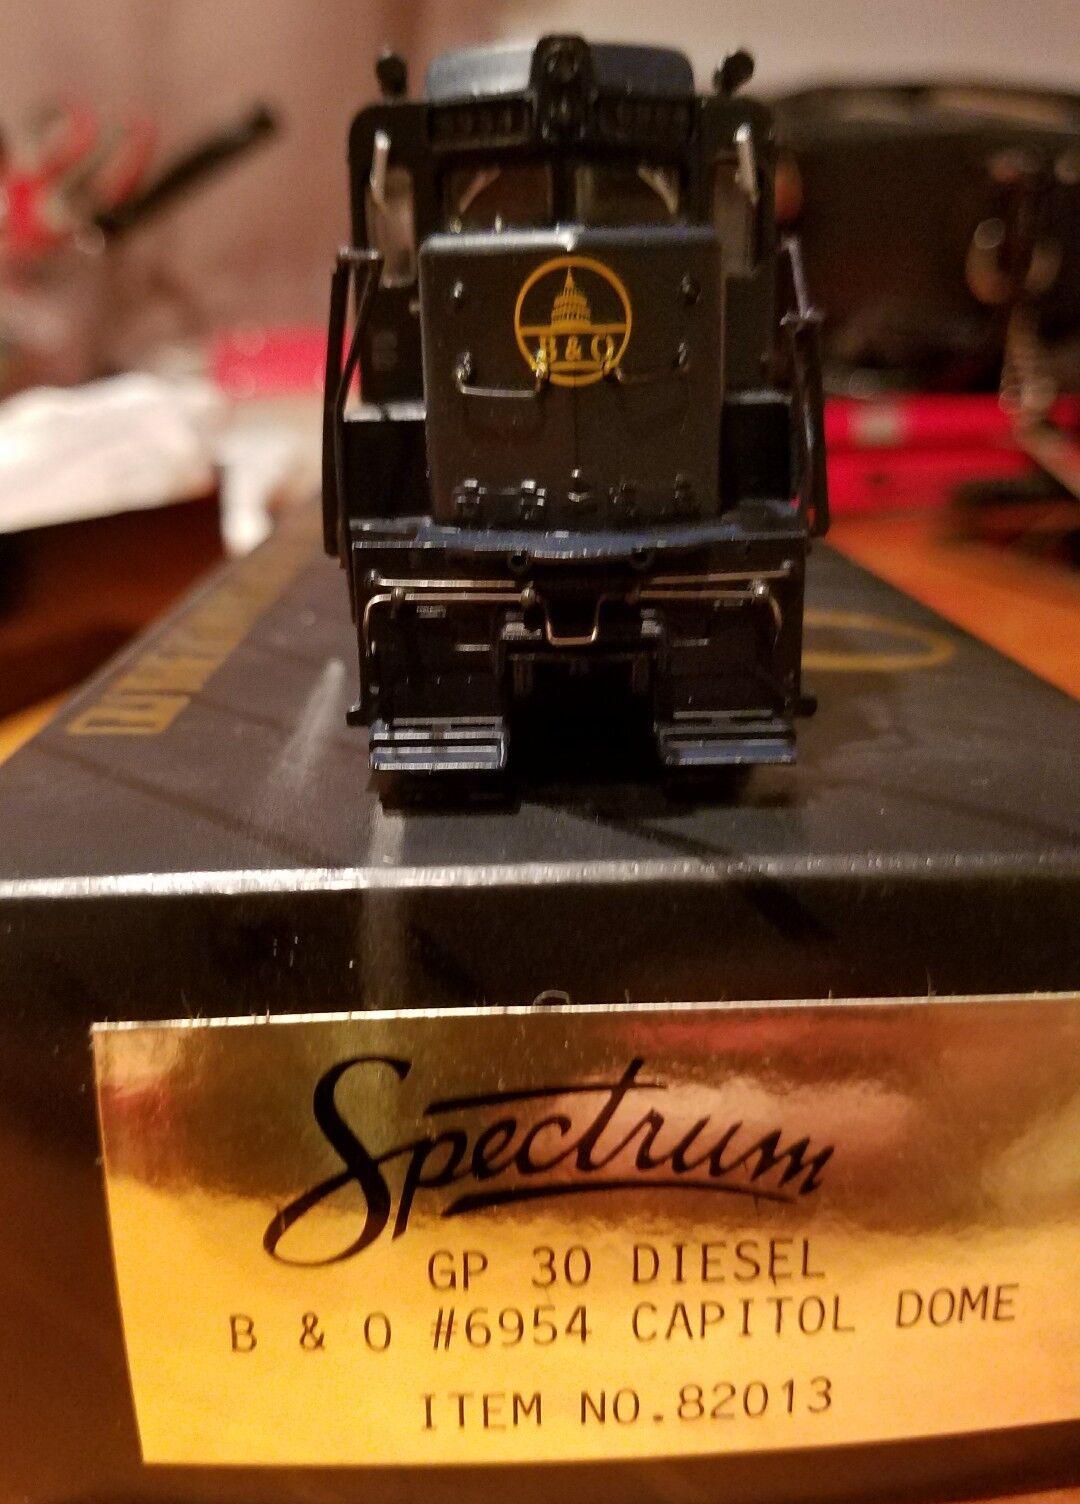 Bachmann Spectrum GP 30 Diesel B &O Capitol Dome Post nr 82013